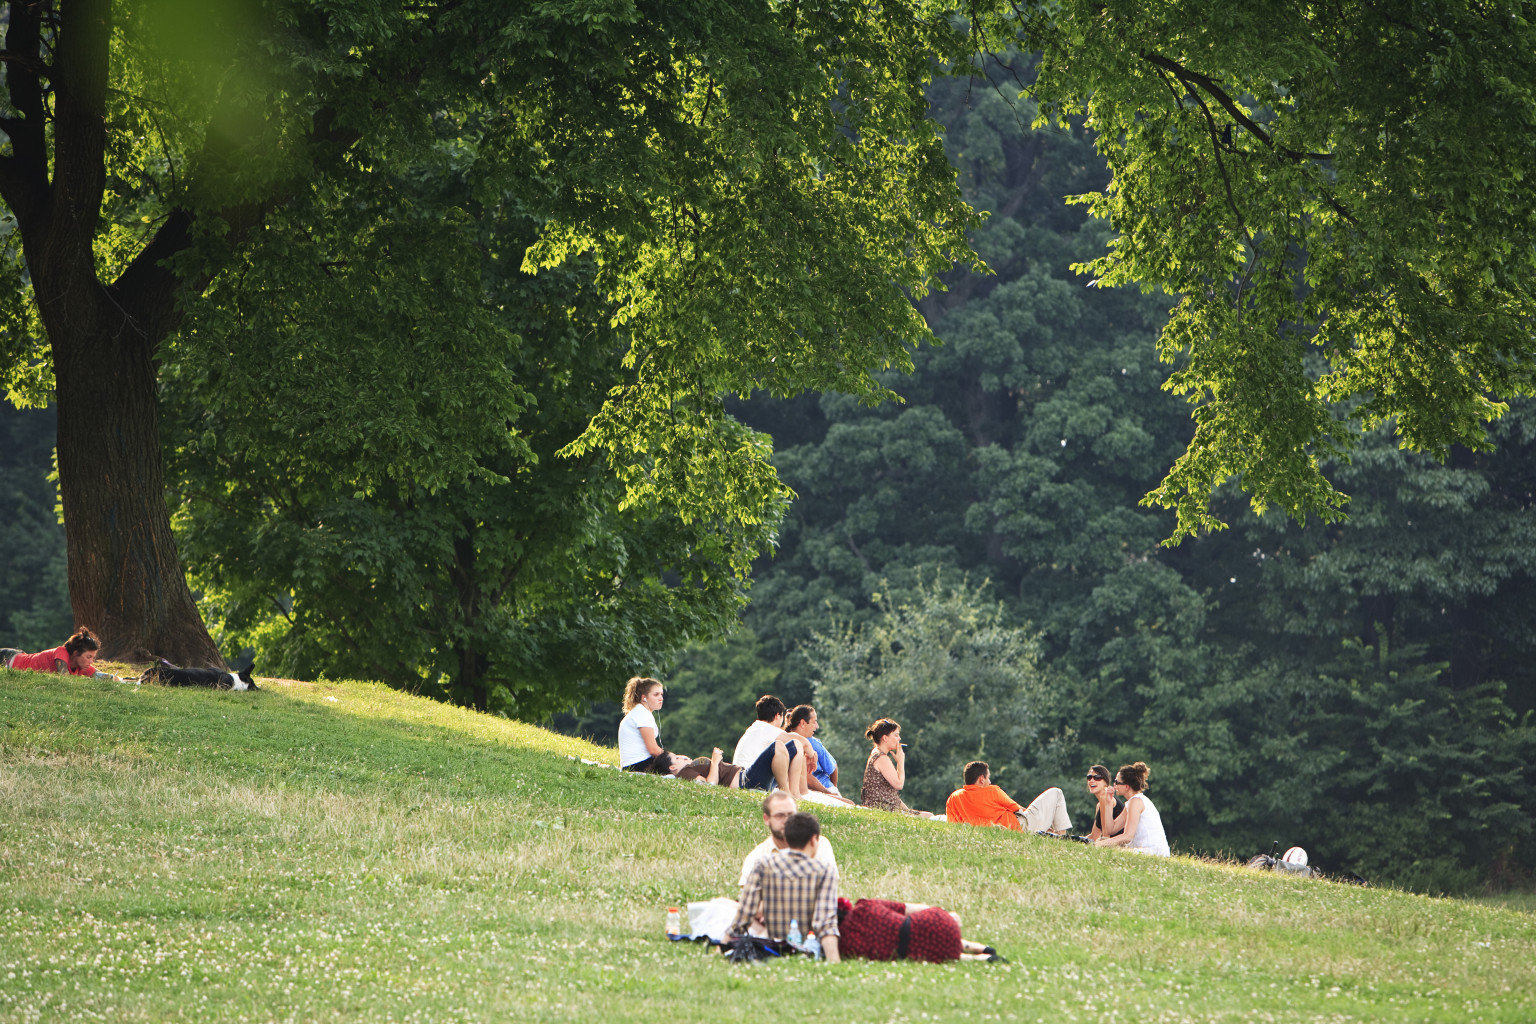 People on lawns in Prospect Park.